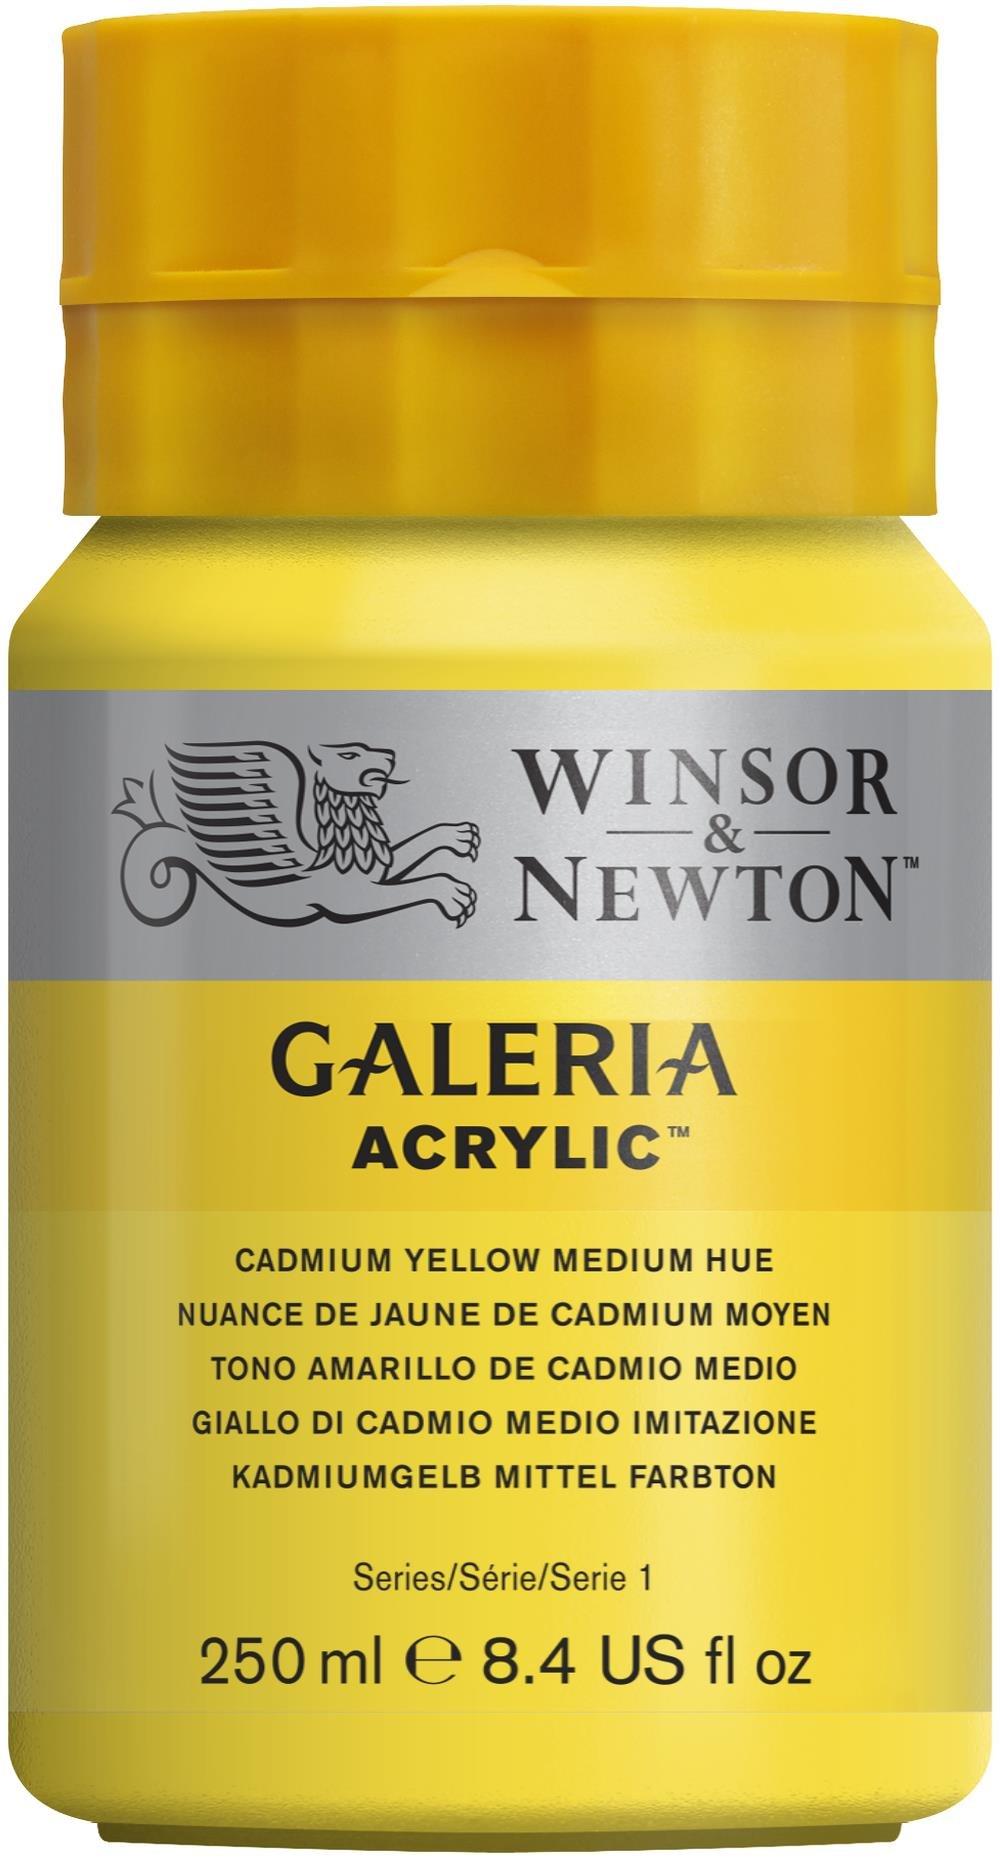 Winsor & Newton Galeria Acrylic Paint, 250ml Bottle, Cadmium Yellow Medium Hue